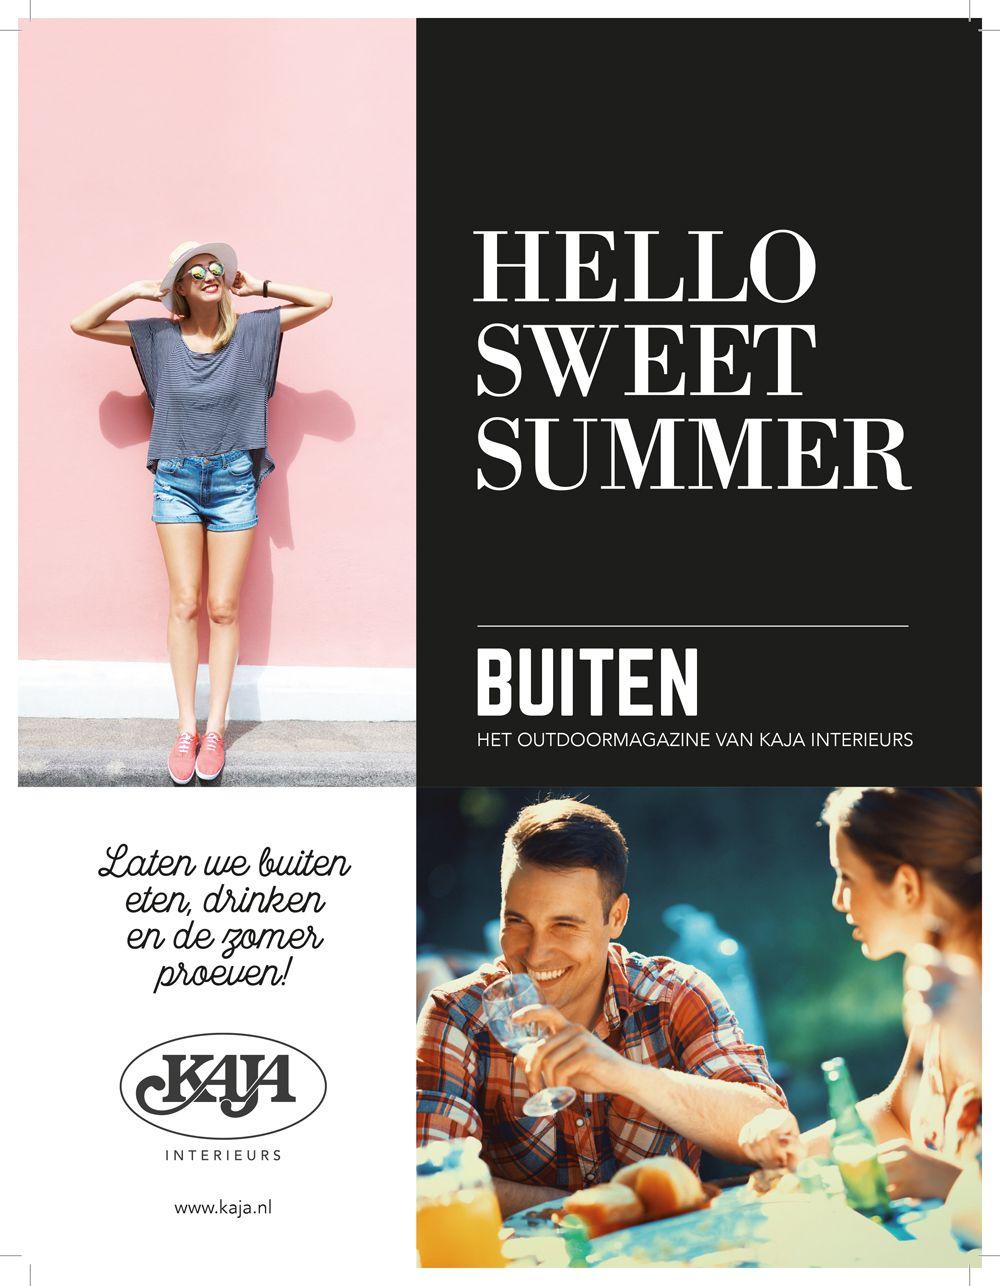 Buitenmagazine Kaja Interieurs 2017   Buiten magazine 2017   Pinterest